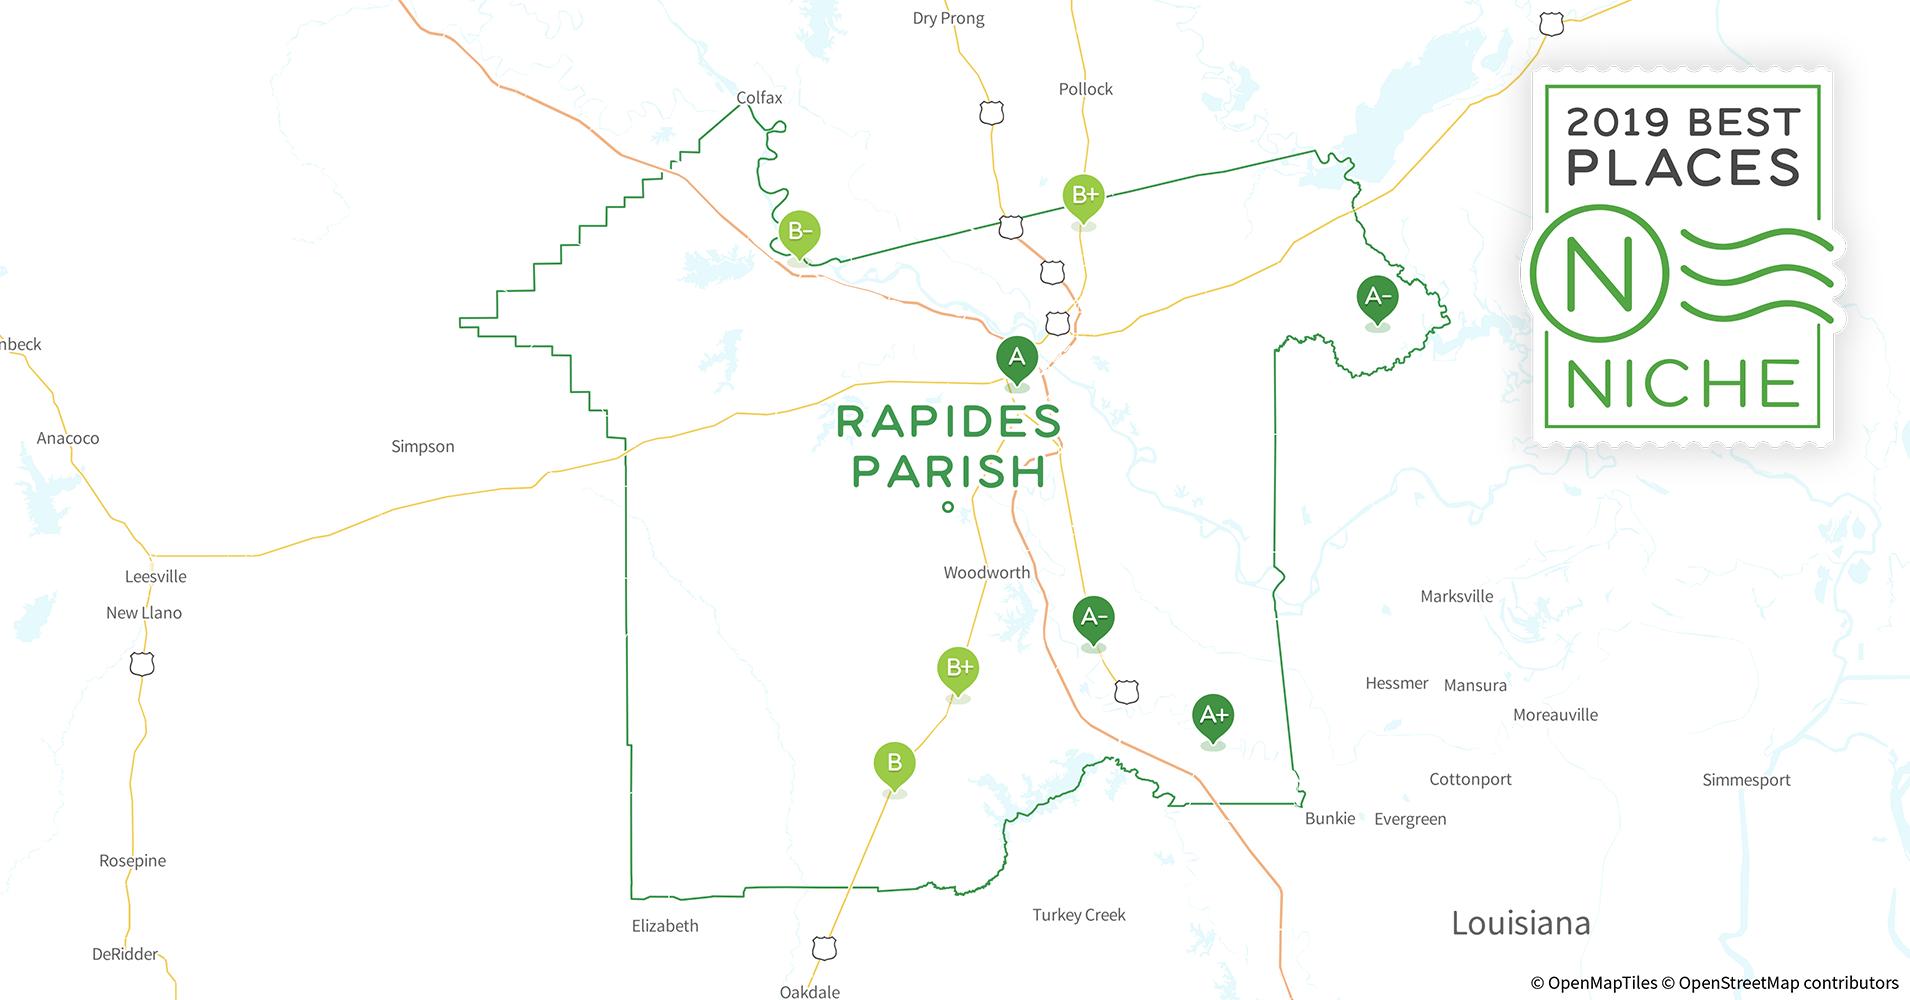 Alexandria Louisiana Zip Code Map.2019 Best Places To Live In Rapides Parish La Niche